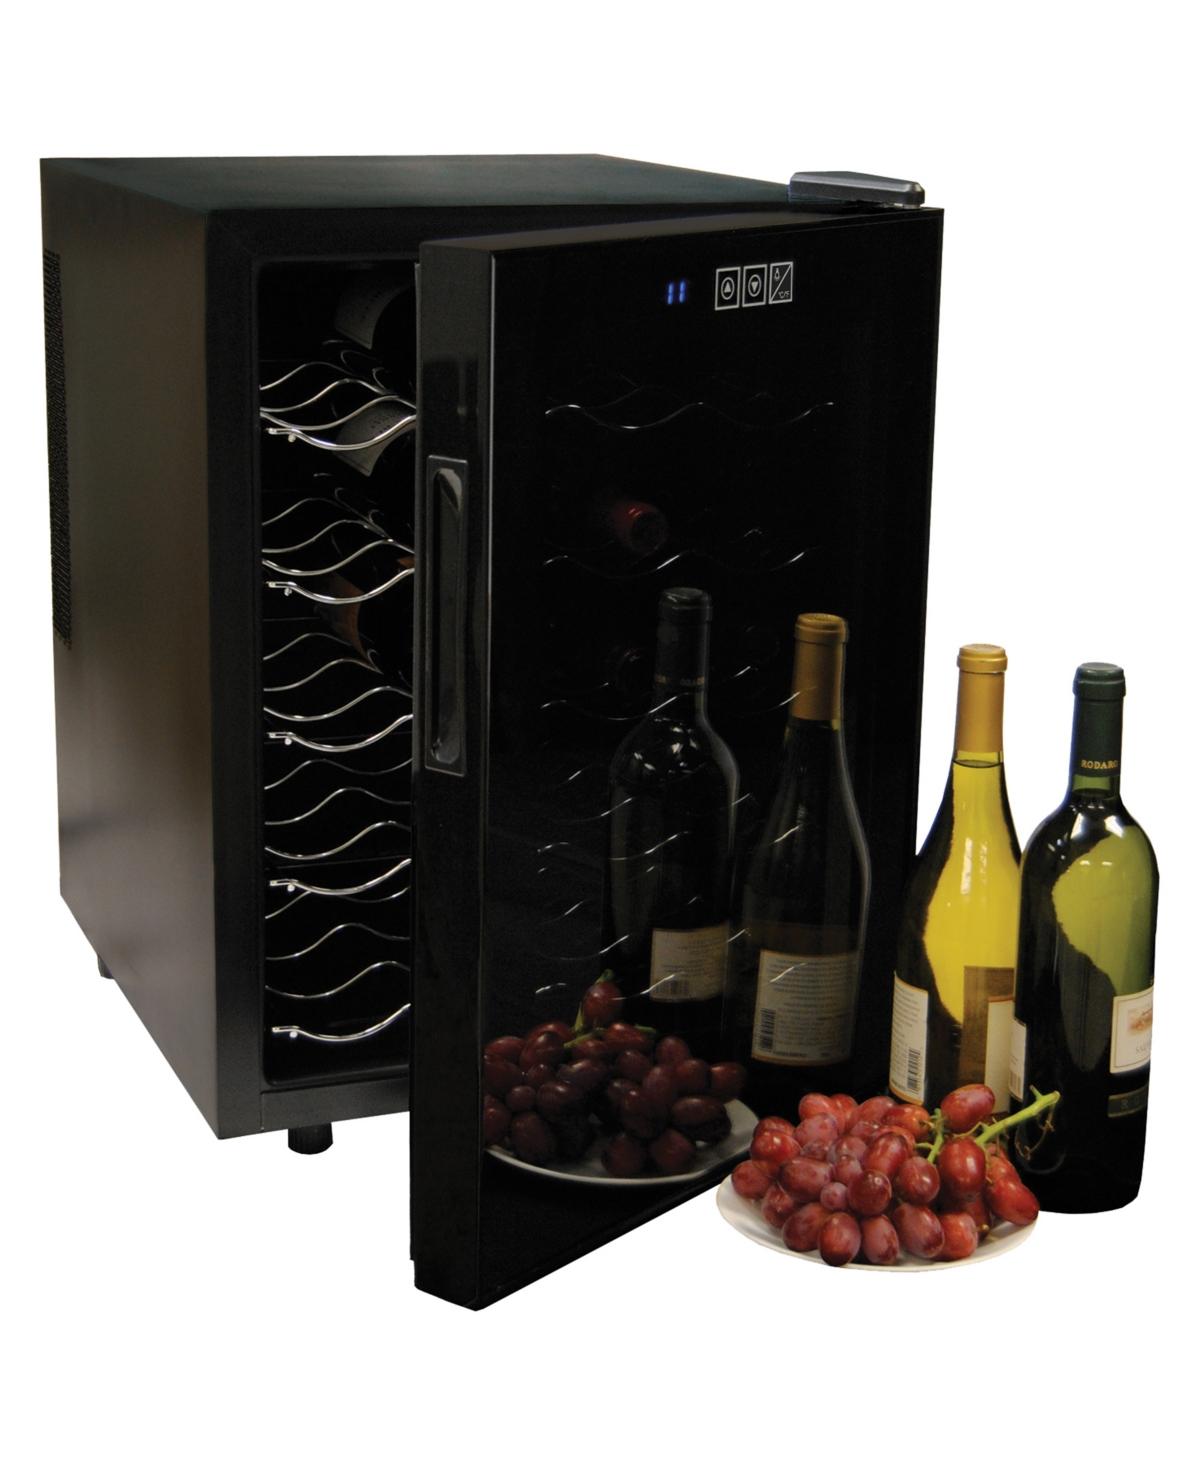 Koolatron Urban Series 20 Bottle Wine Cooler, Thermoelectric Wine Fridge, Freestanding Wine Cellar for Home Bar, Small Kitchen, Apartment, Condo, Cottage, Rv